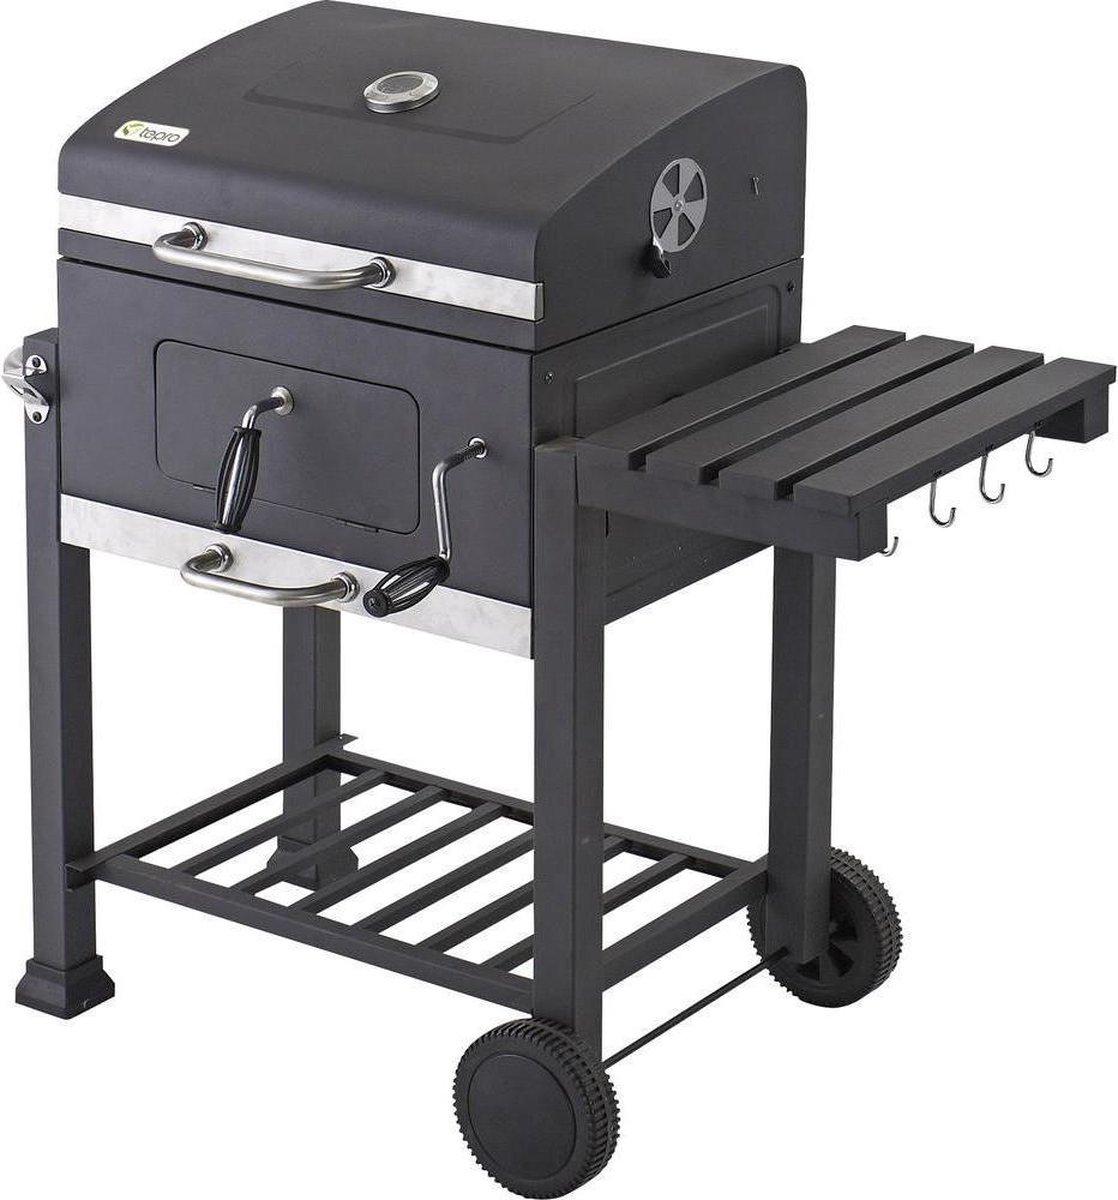 Tepro Garten Toronto Barbecue -  Grilloppervlak (LxB) 56 x 42 cm - Thermometer In Deksel - RVS